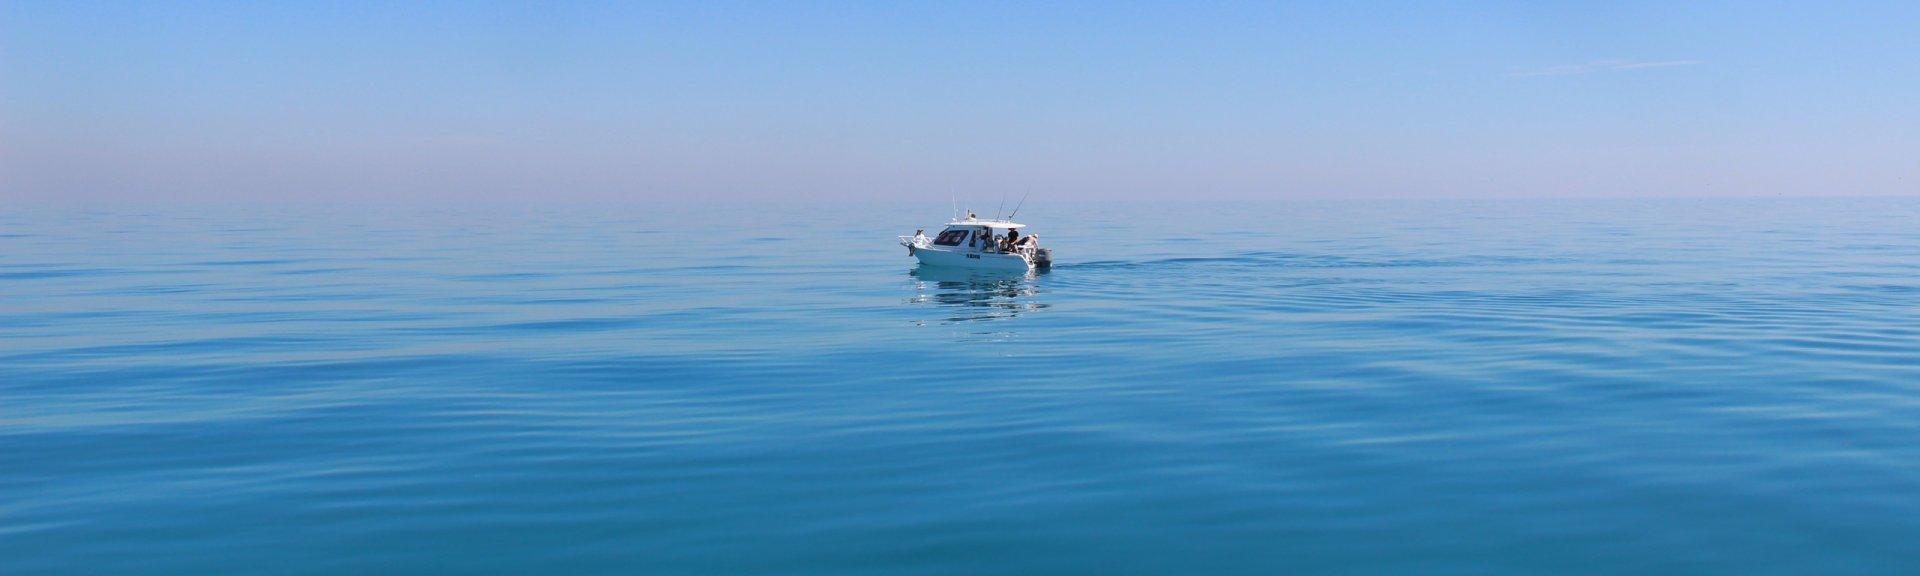 Recreational fishing | Australian Marine Parks